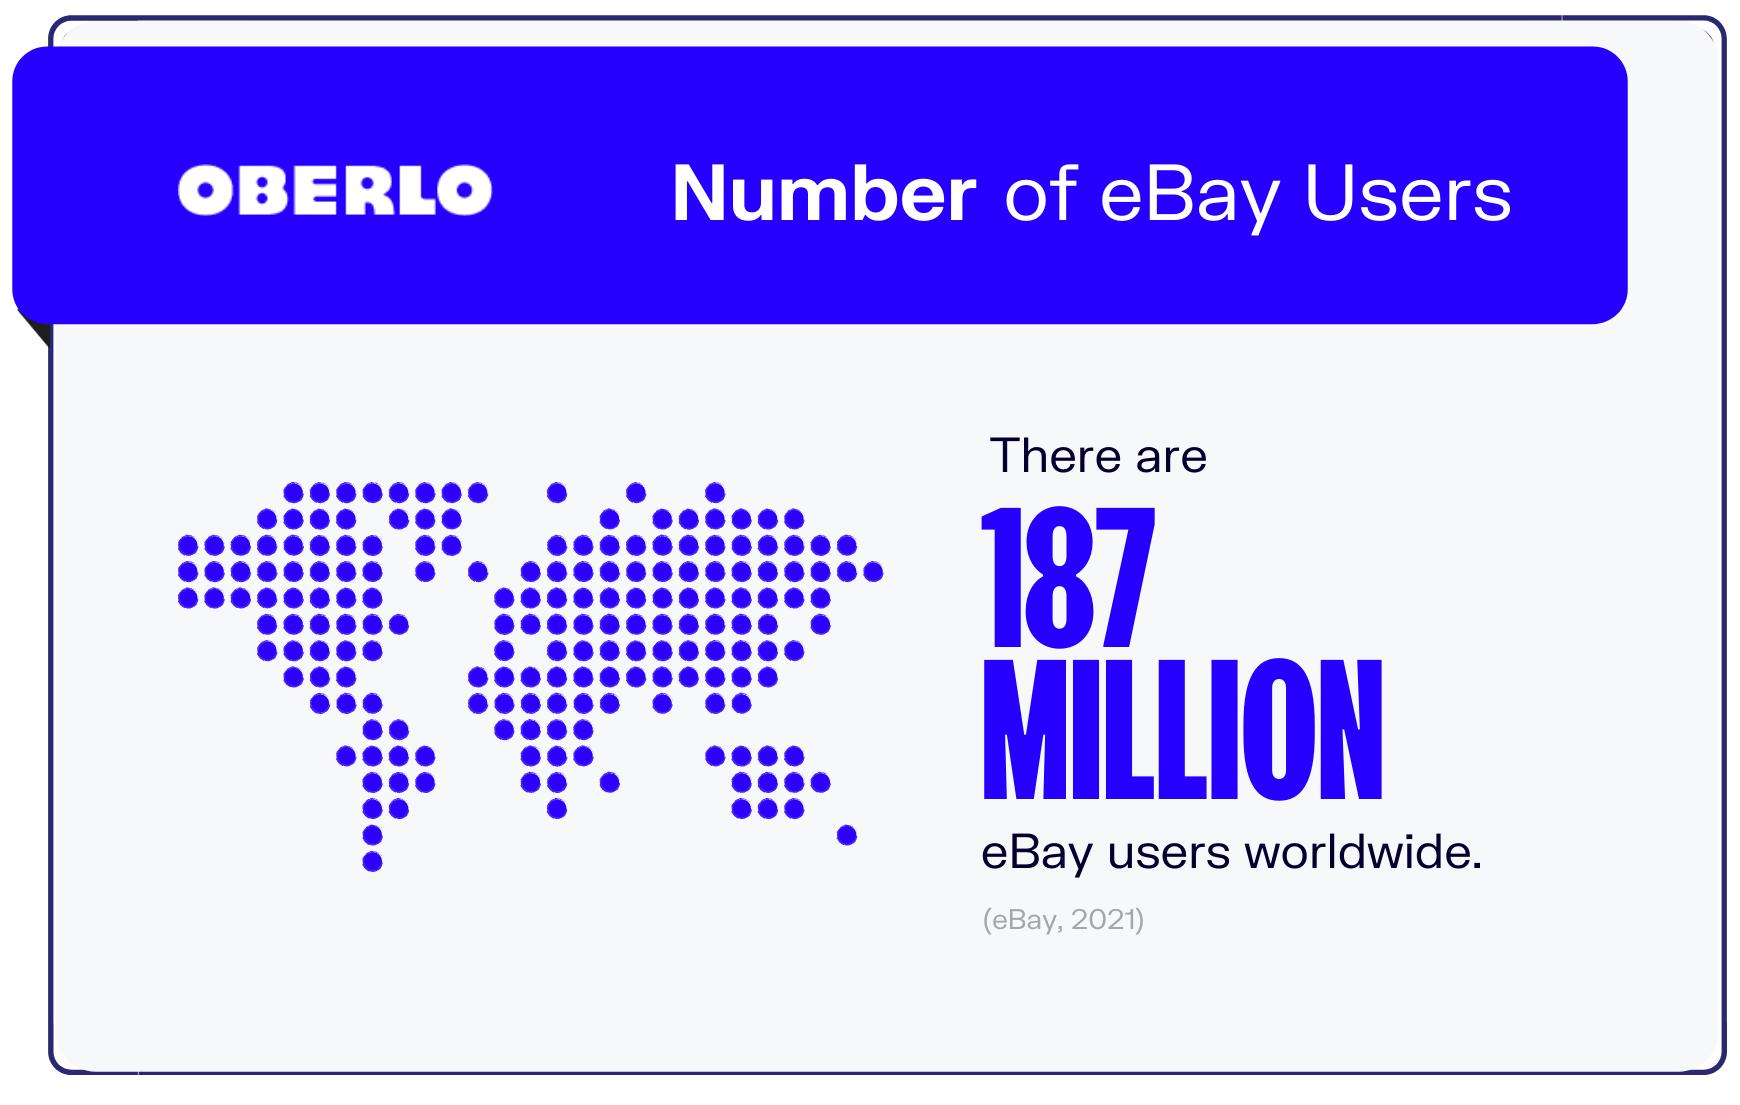 ebay statistics graphic 1